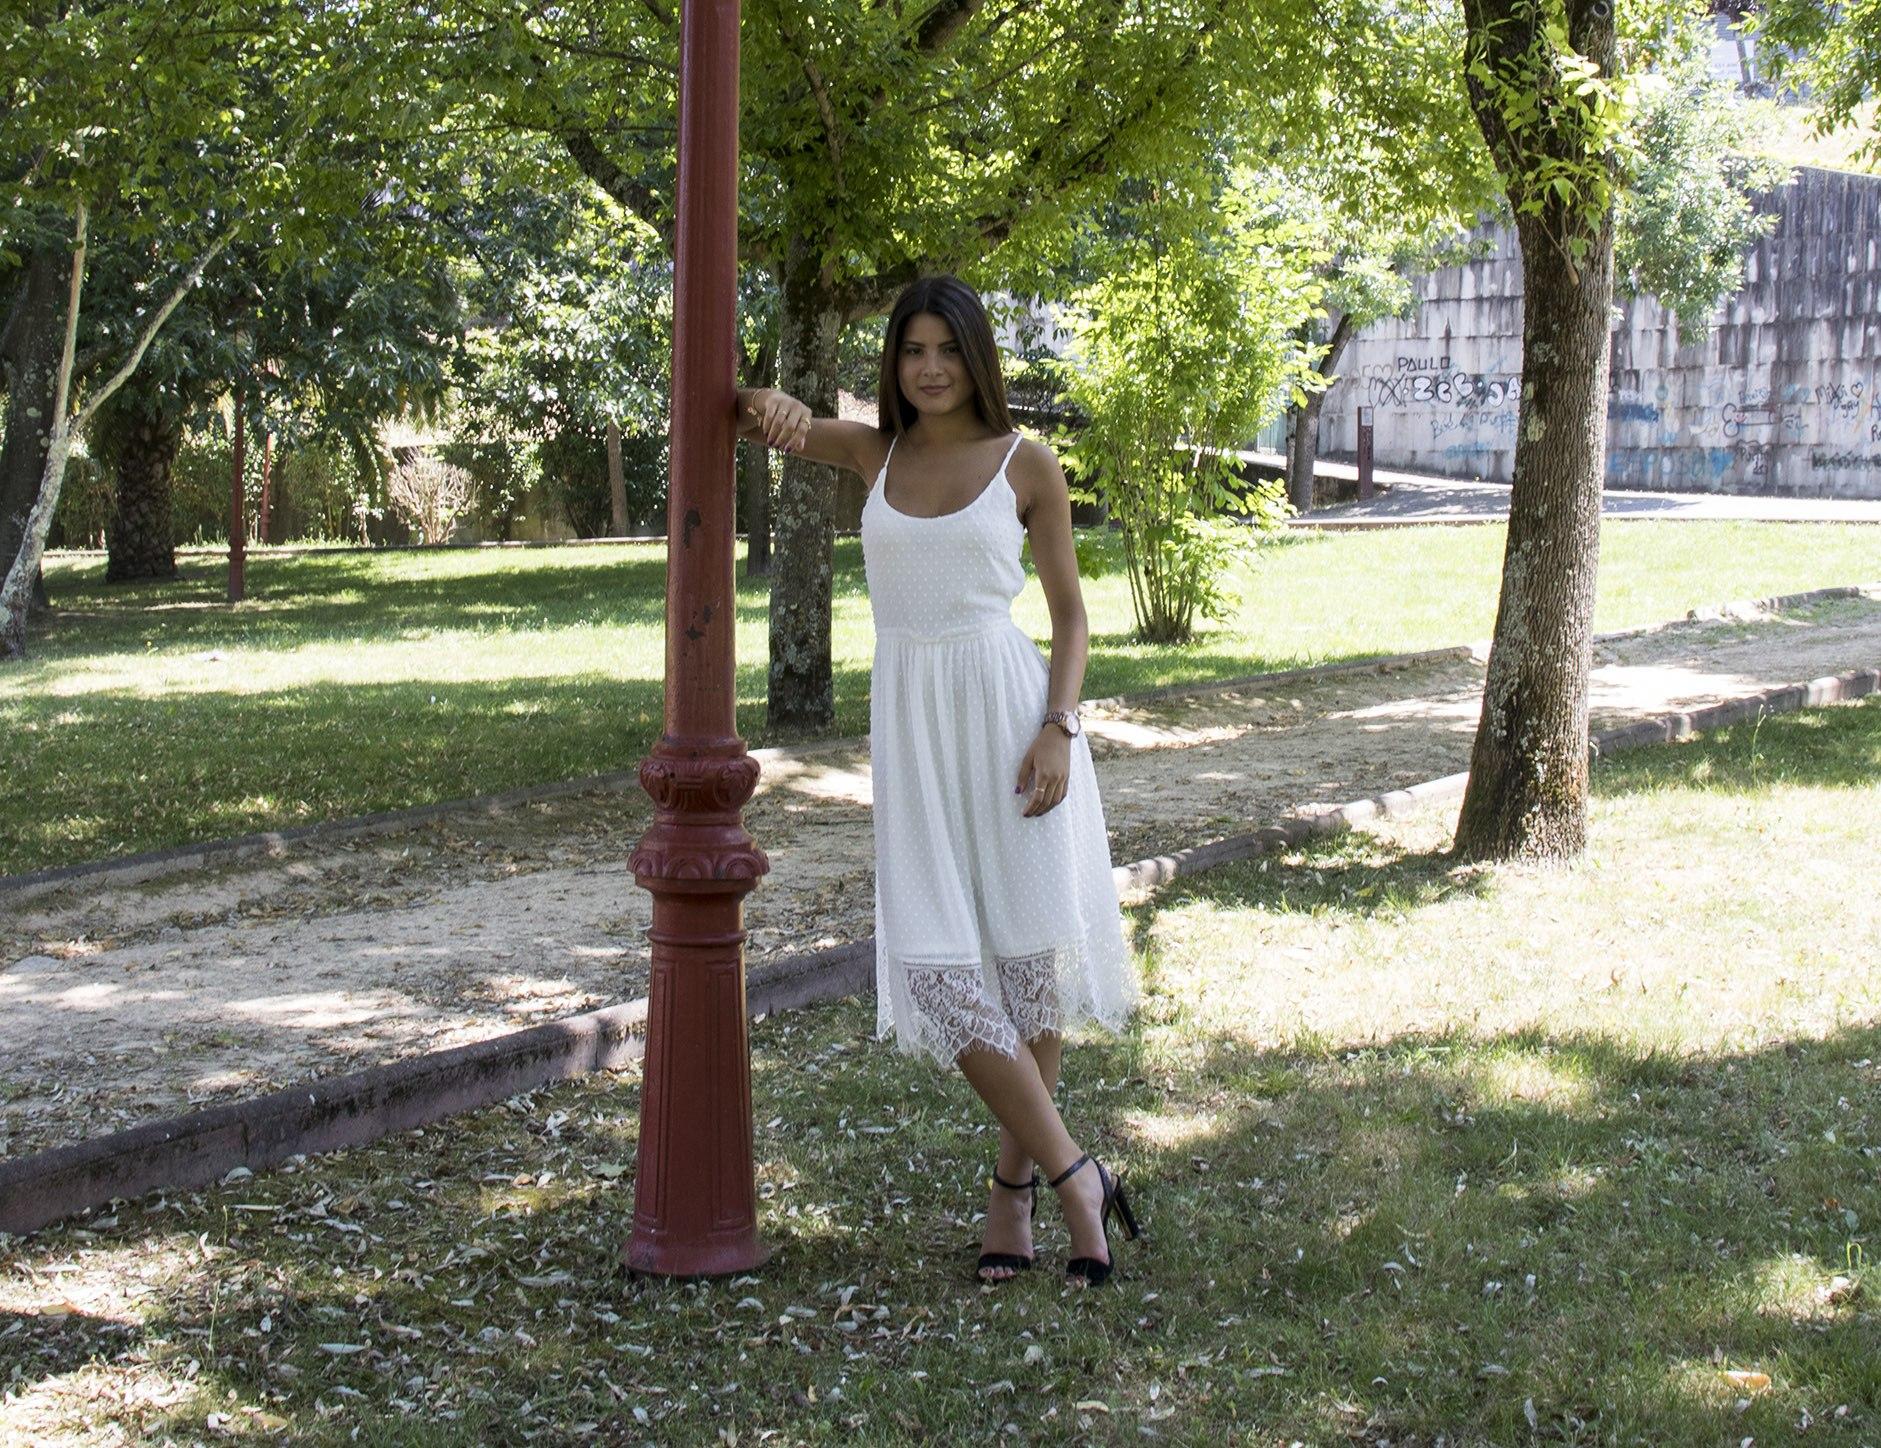 Outfit mujer: Vestido blanco de gasa con estampado de puntitos, vaporoso, fresquito